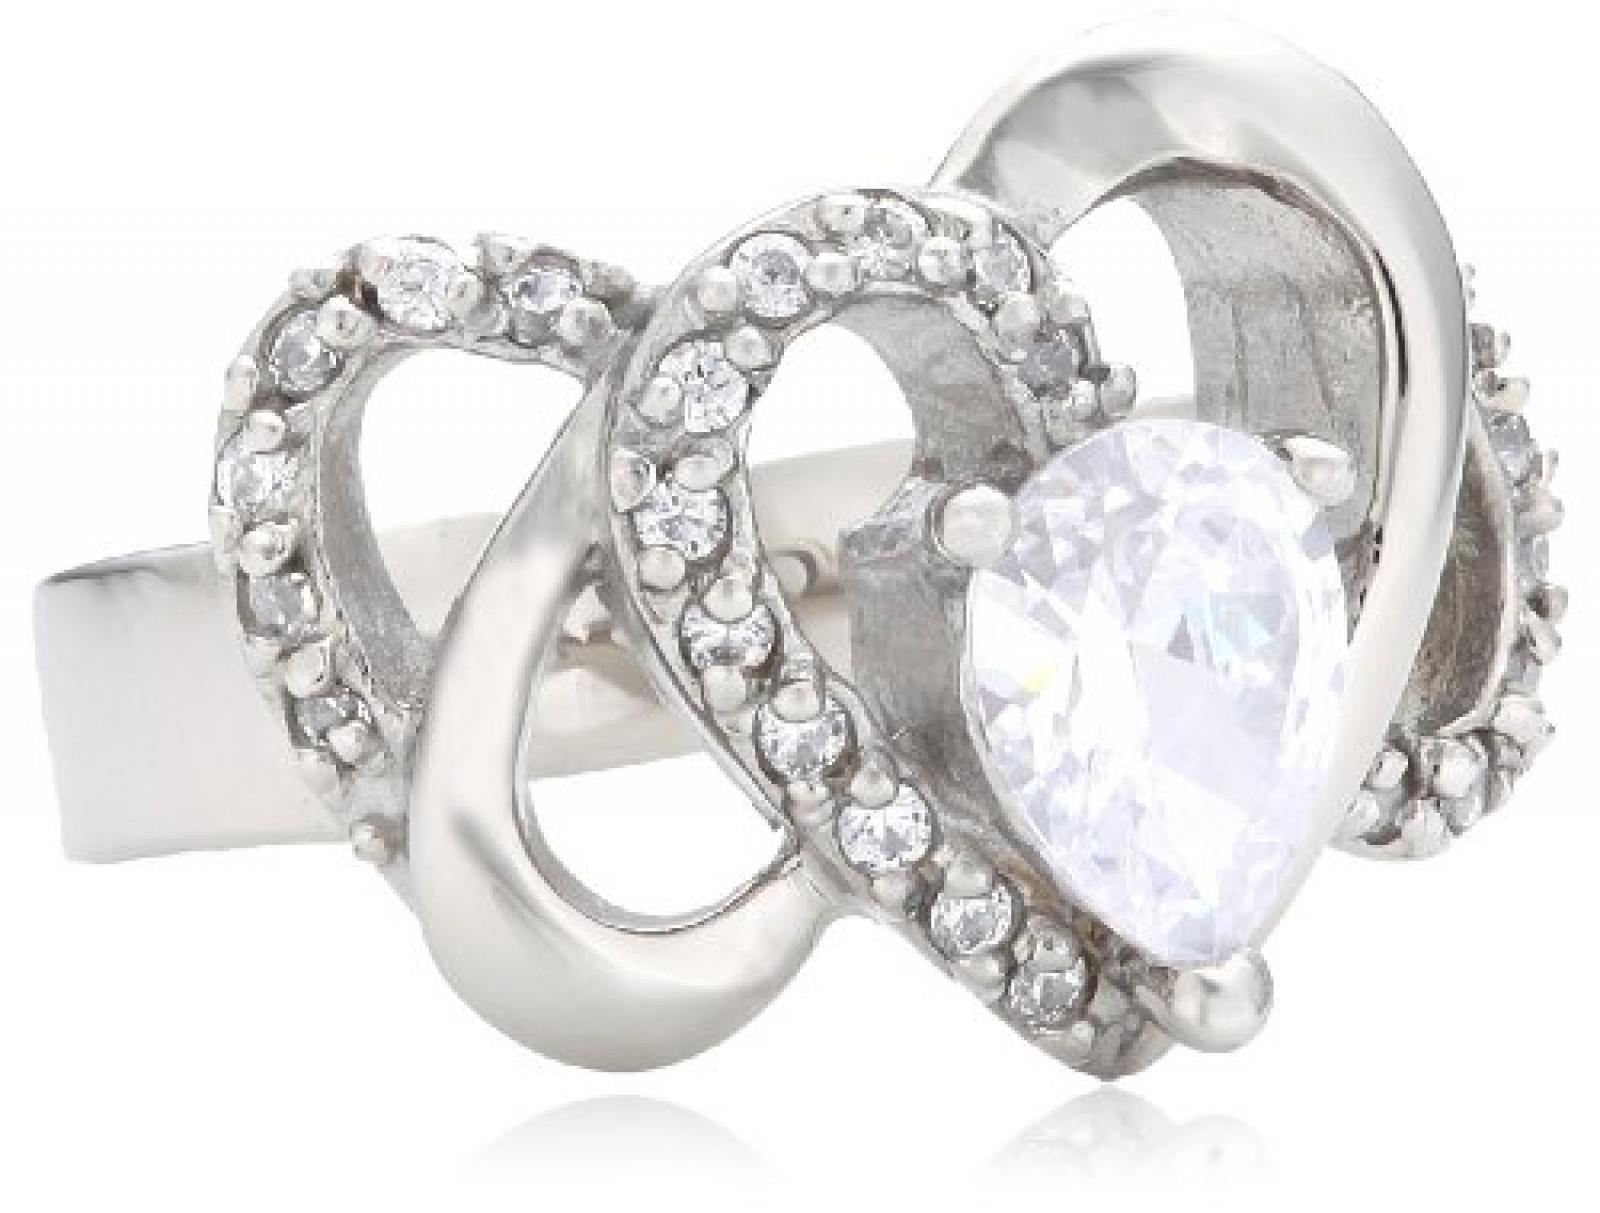 Mike Ellis New York Damen-Ring Edelstahl Zirkonia weiß Gr.52 (16.6) D1506C